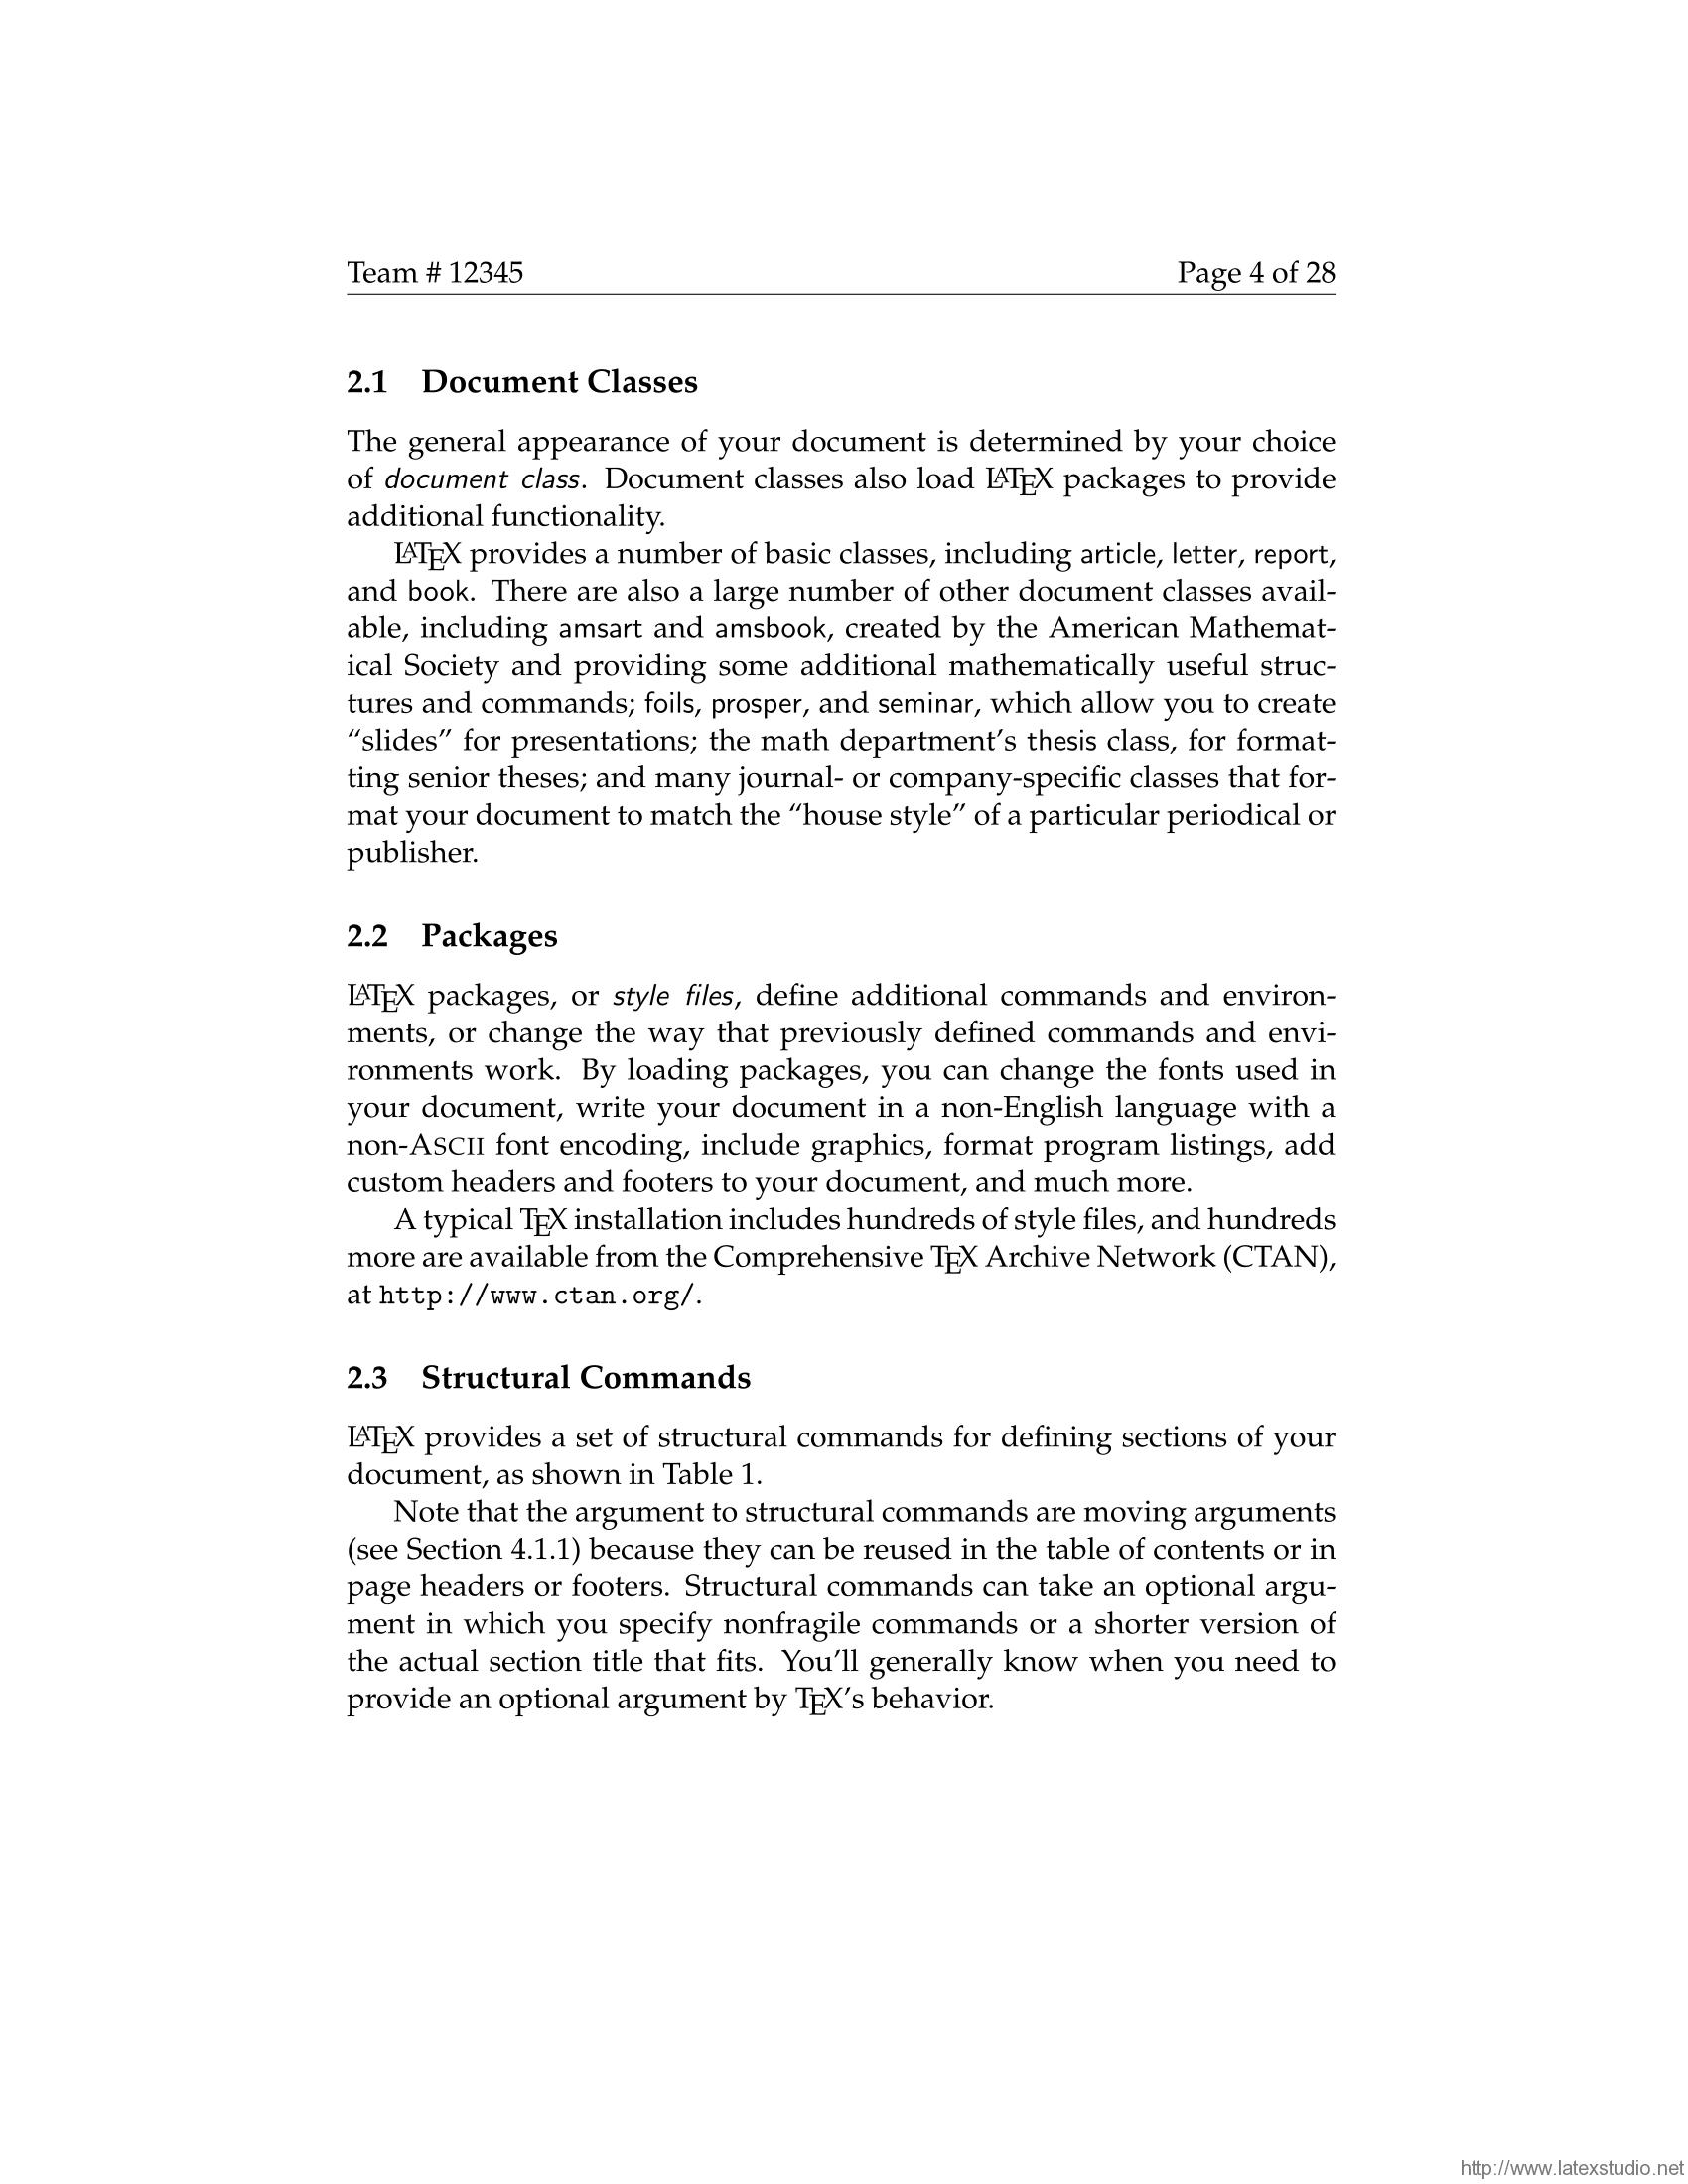 icmmcm-sample-05